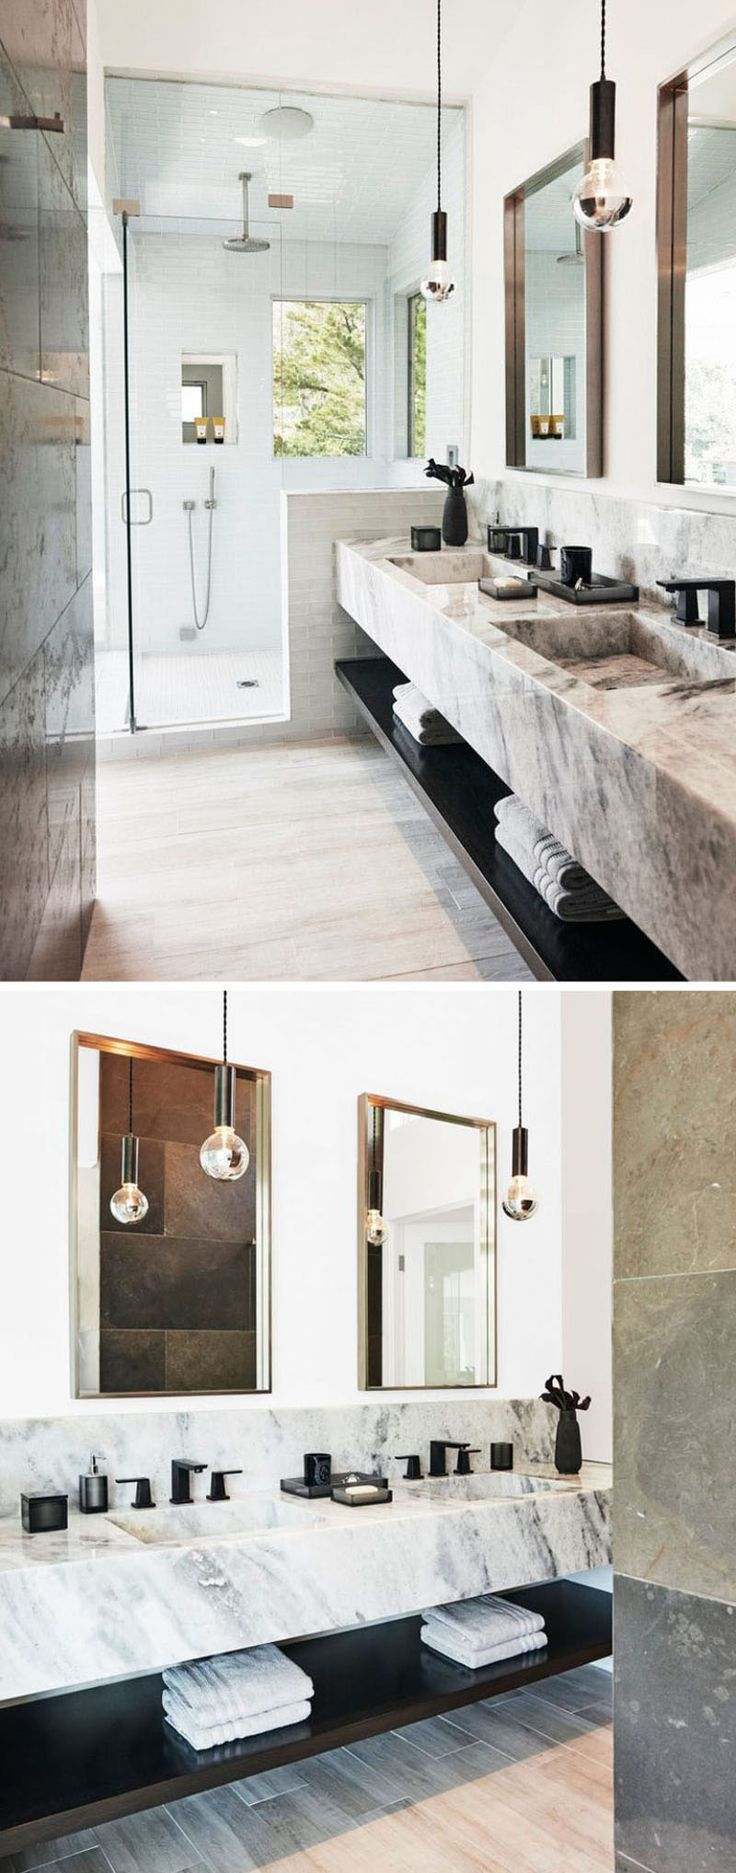 187 kitchen 187 kitchen sinks 187 nativestone 187 farmhouse double bowl - Bathroom Design Idea An Open Shelf Below The Countertop 17 Pictures